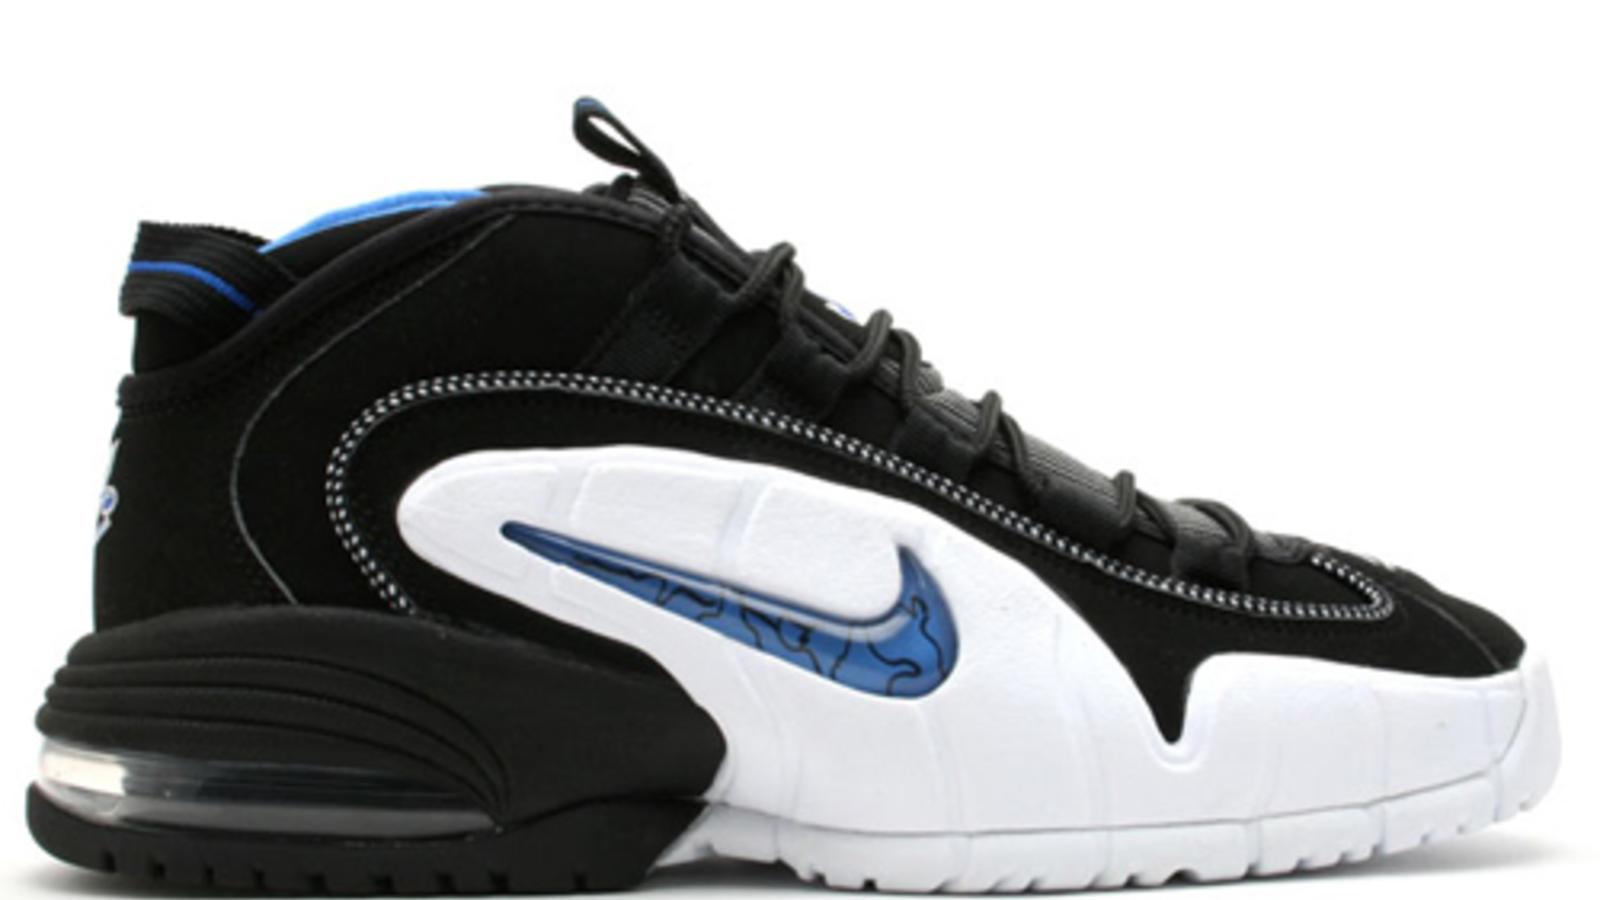 1995 Nike Air Max - Penny Hardaway